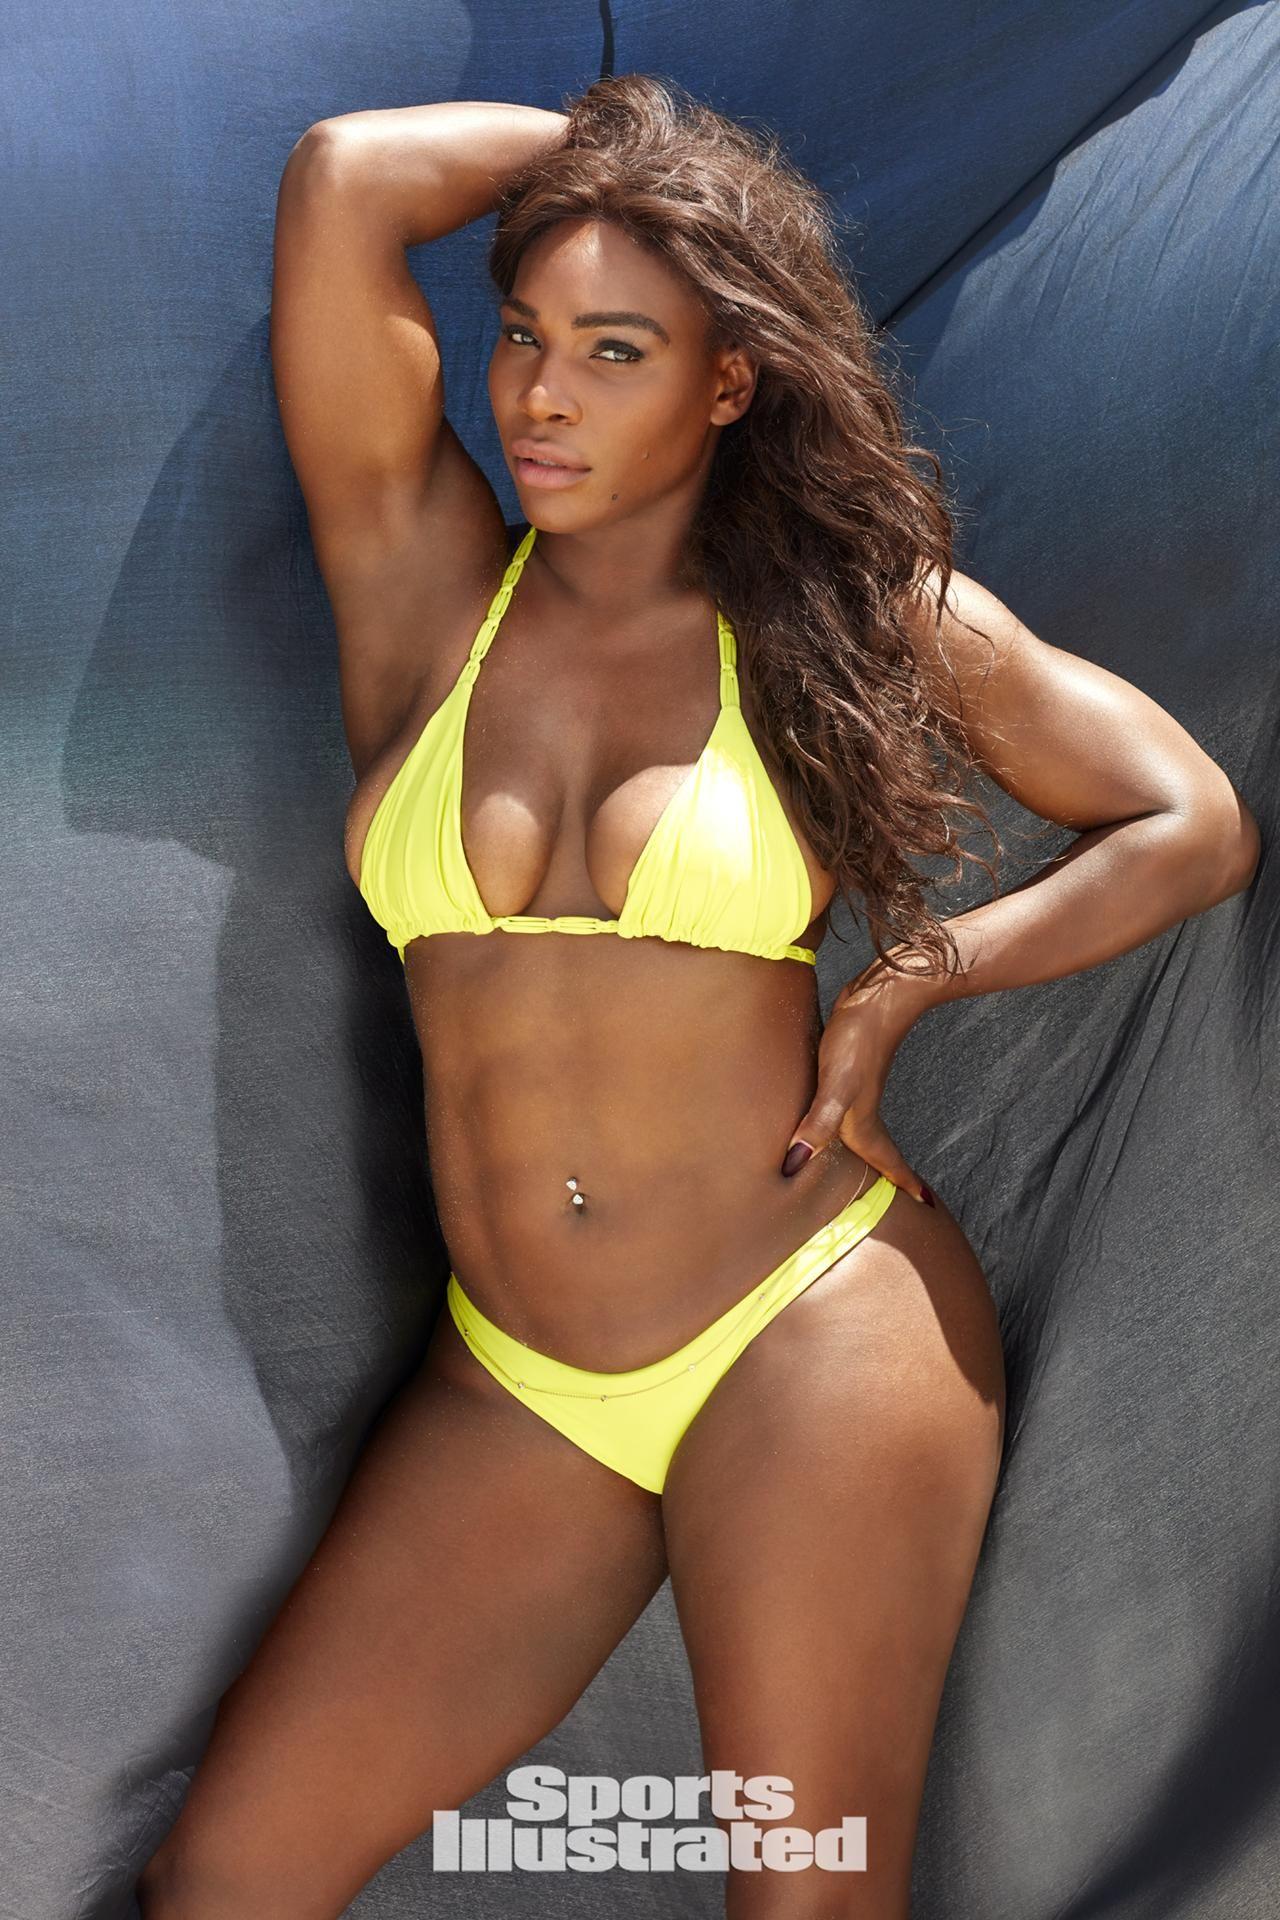 Pics Diamond Jackson nudes (52 foto and video), Sexy, Sideboobs, Feet, butt 2019